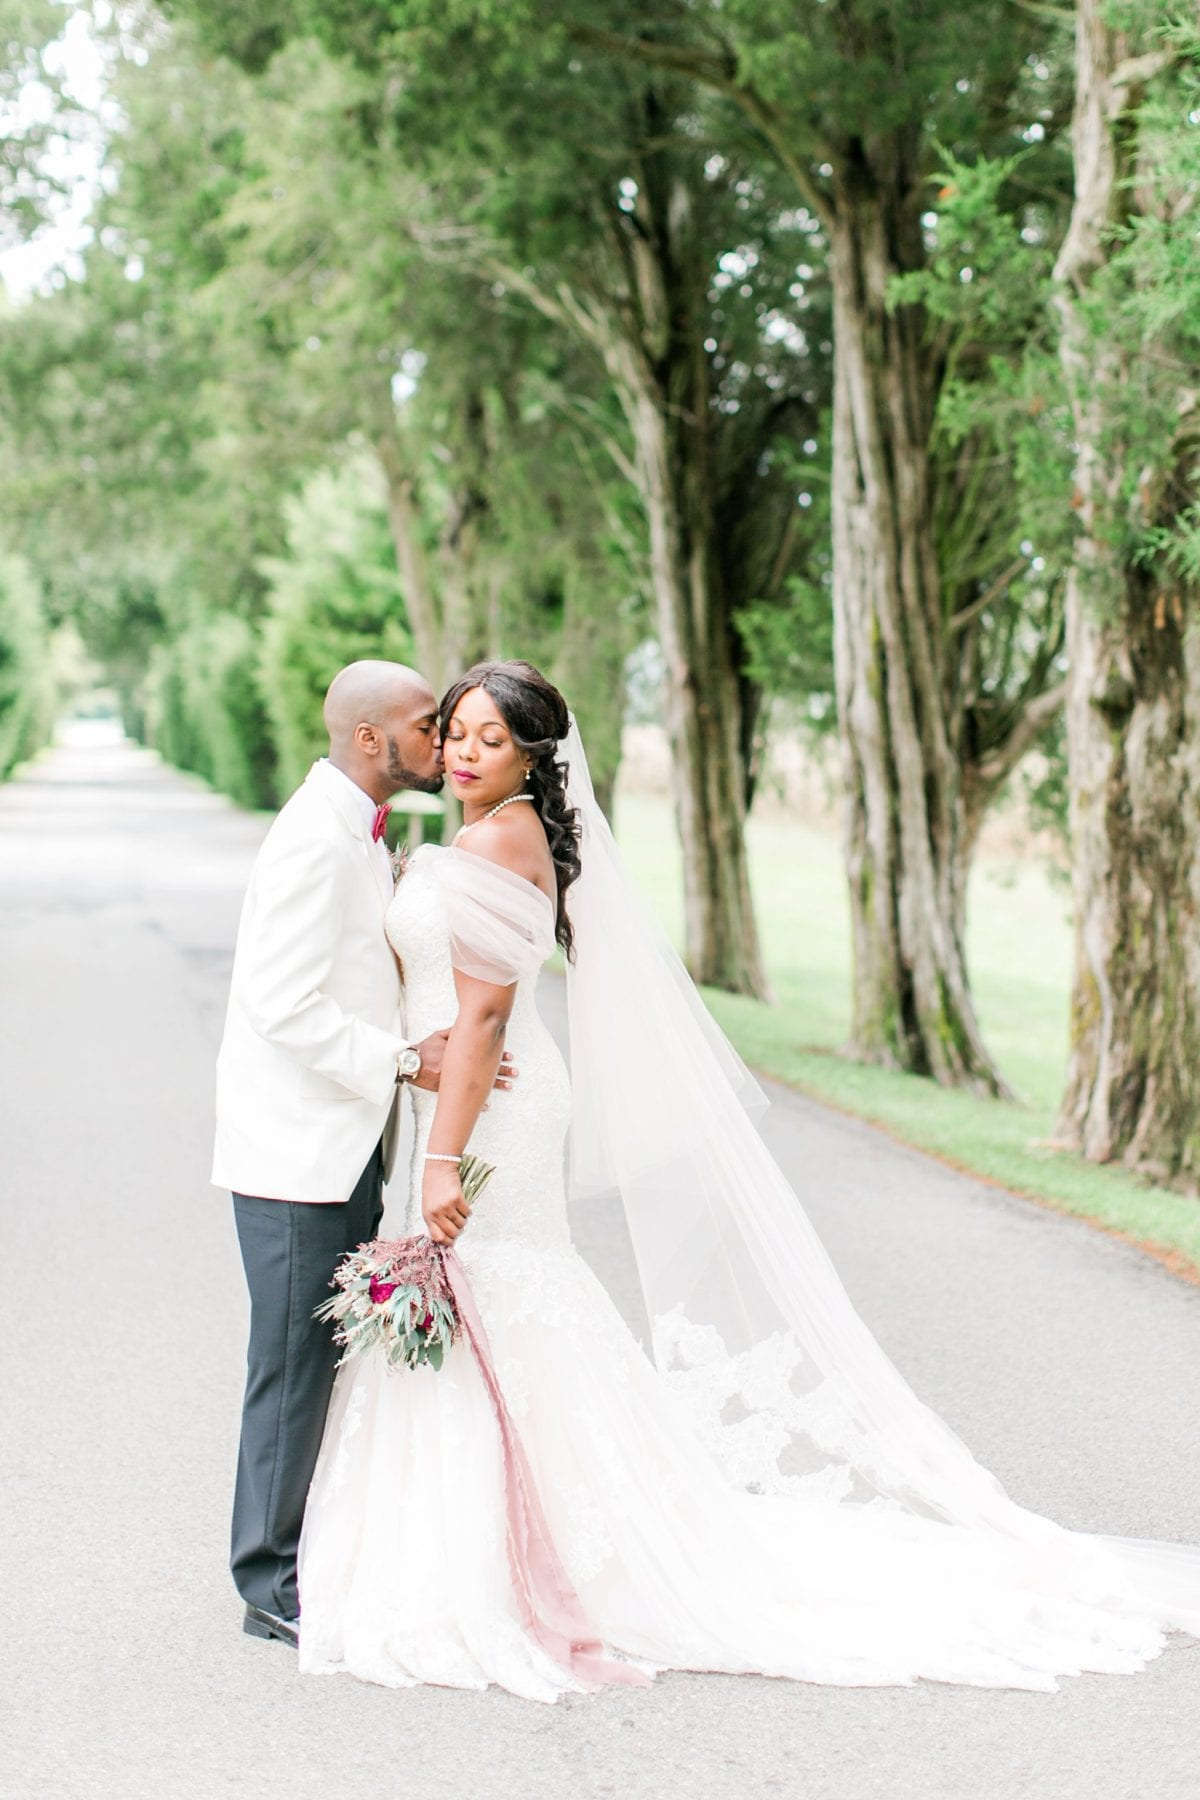 Jefferson Patterson Park Wedding Maryland Wedding Photographer Megan Kelsey Photography Jasmine & Seyi-50.jpg